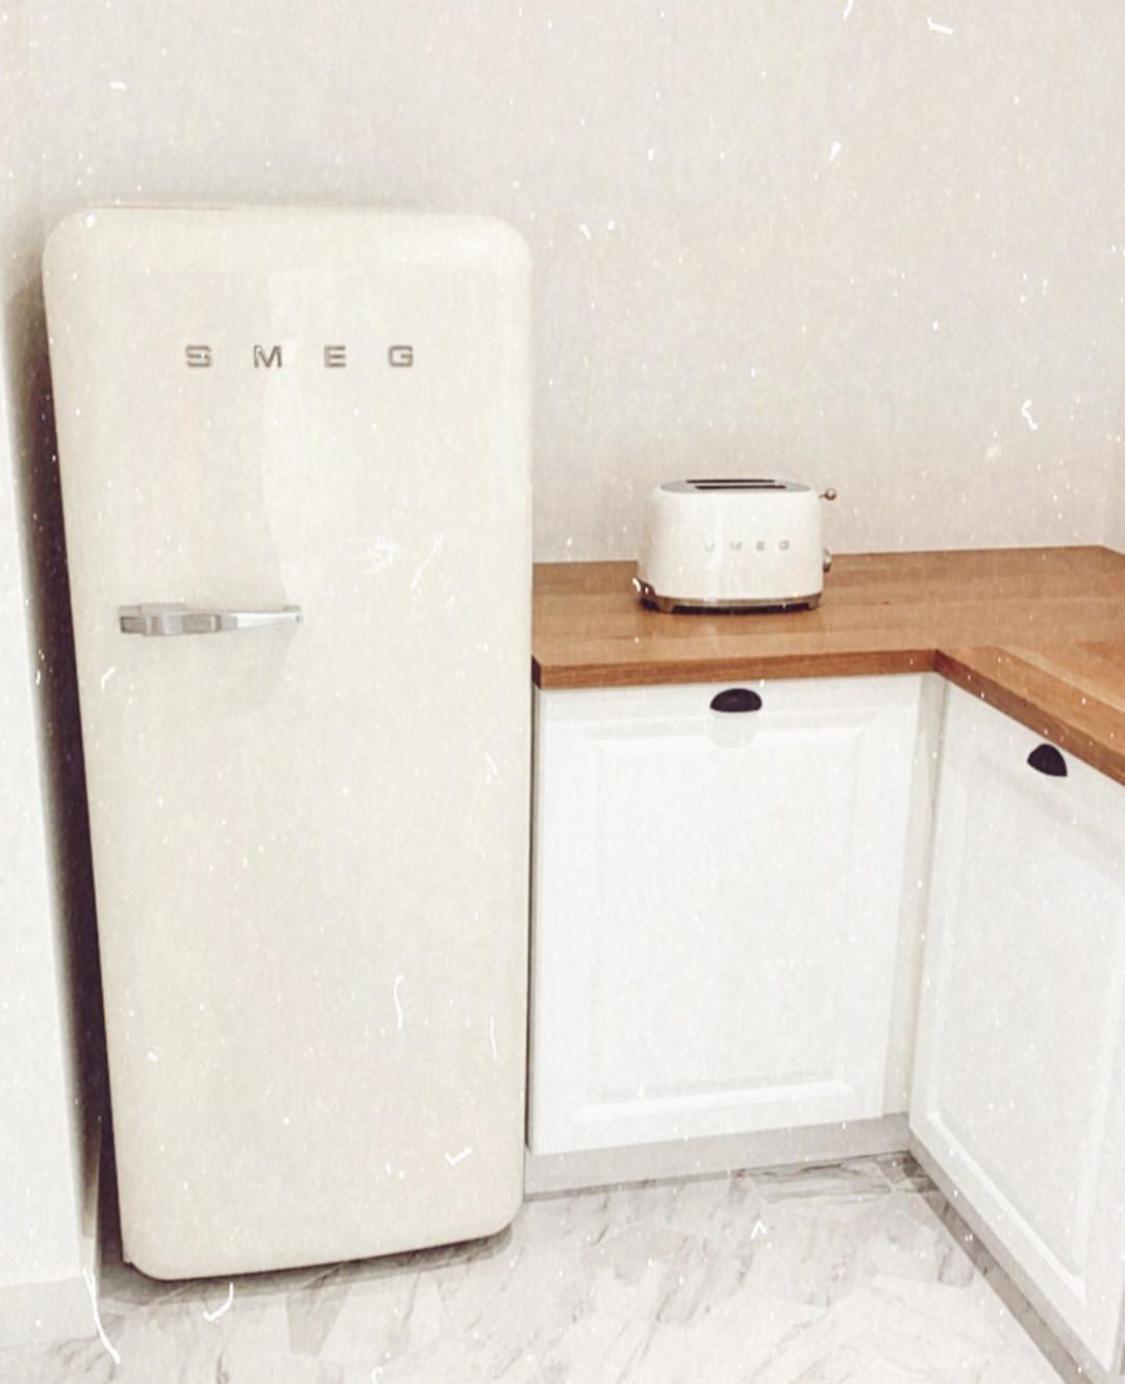 La cuisine de l'influenceuse babyatoutprix avec son frigo Smeg beige